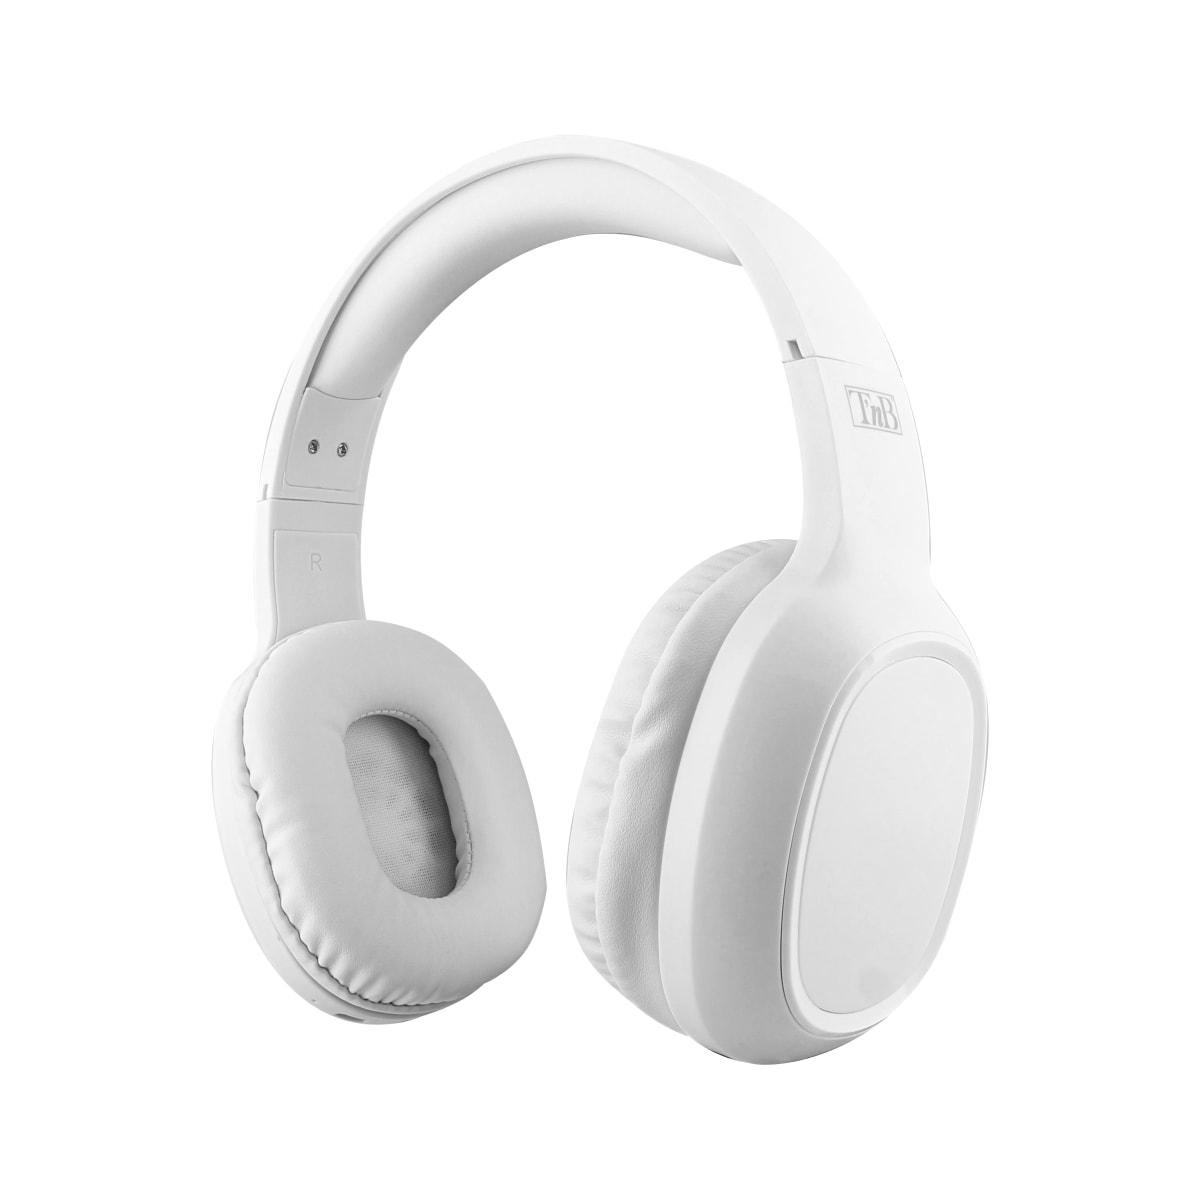 HTAG Bluetooth headphone white